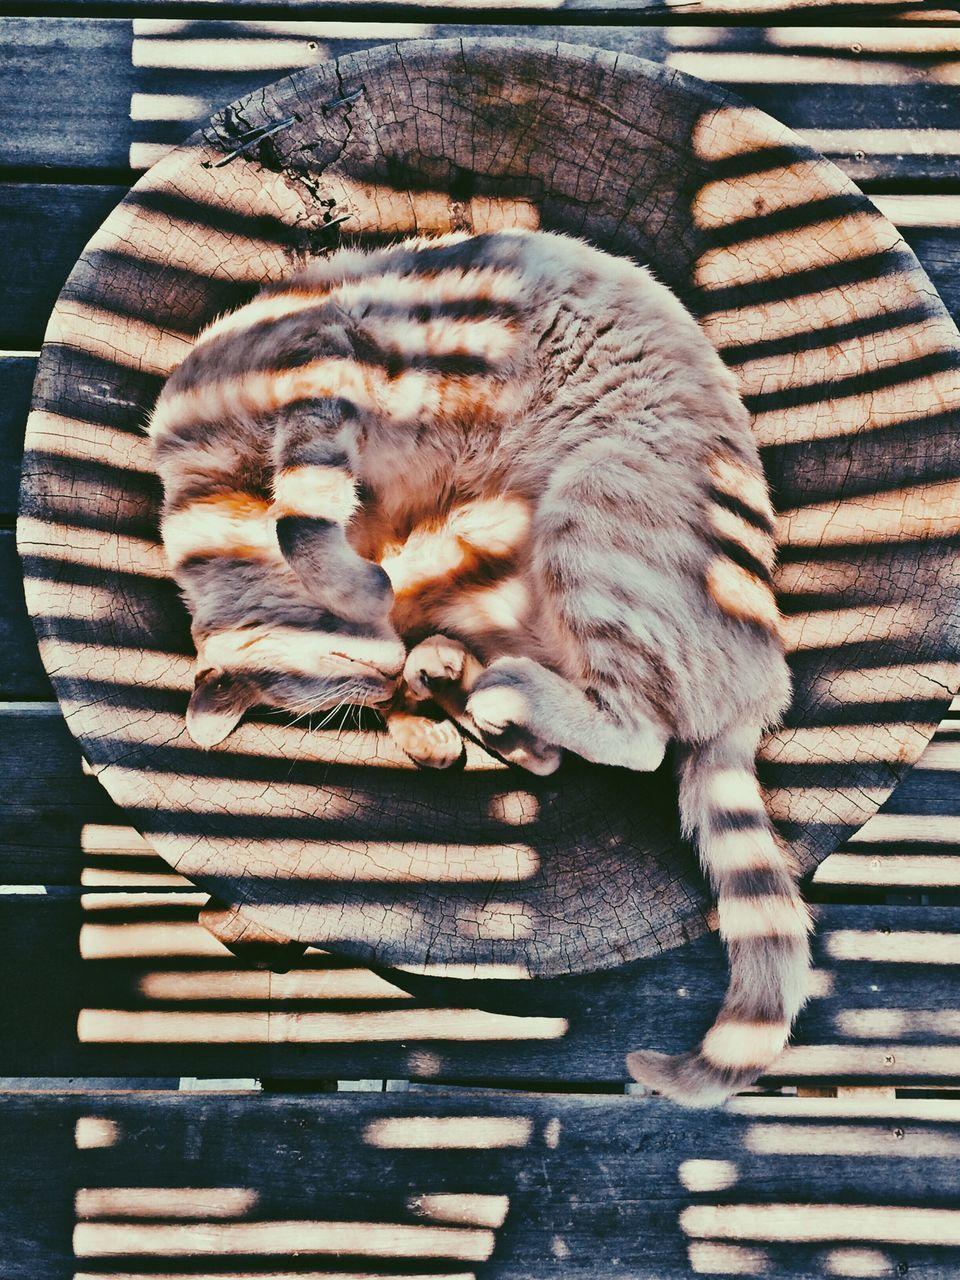 Close-up high angle view of cat sleeping on tree stump